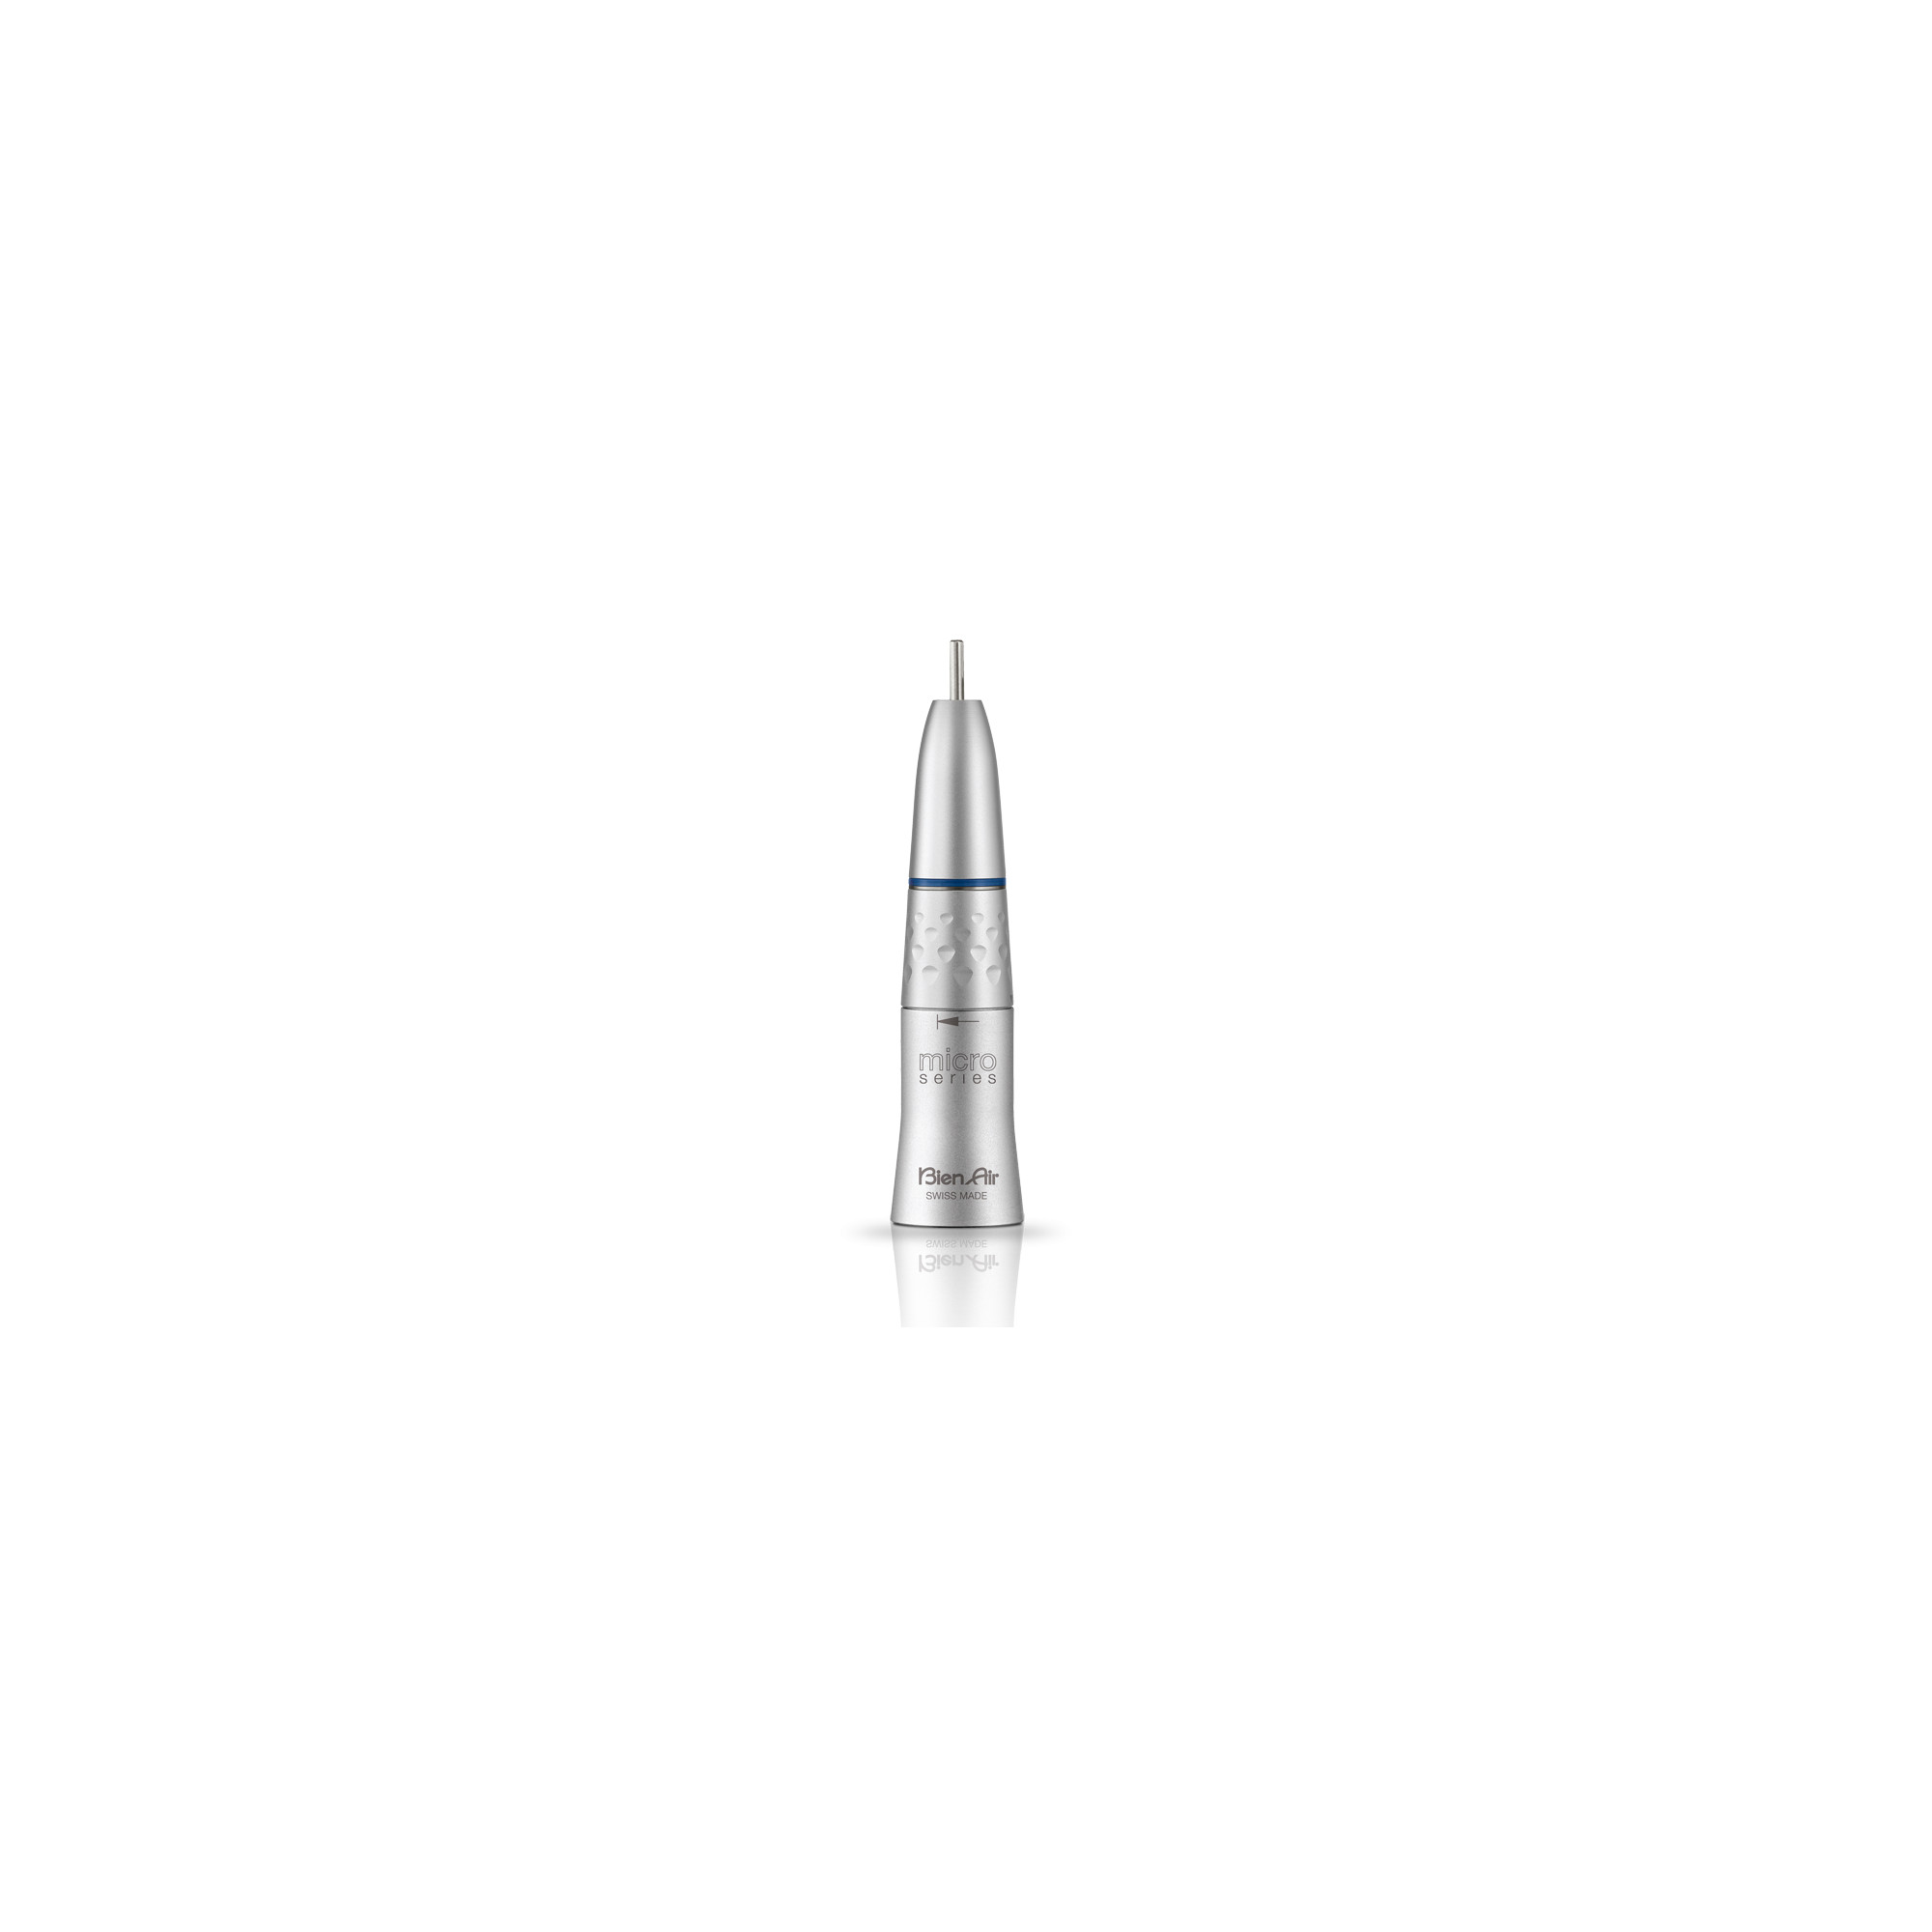 Pièce à main Bien Air micro série droite à spray interne